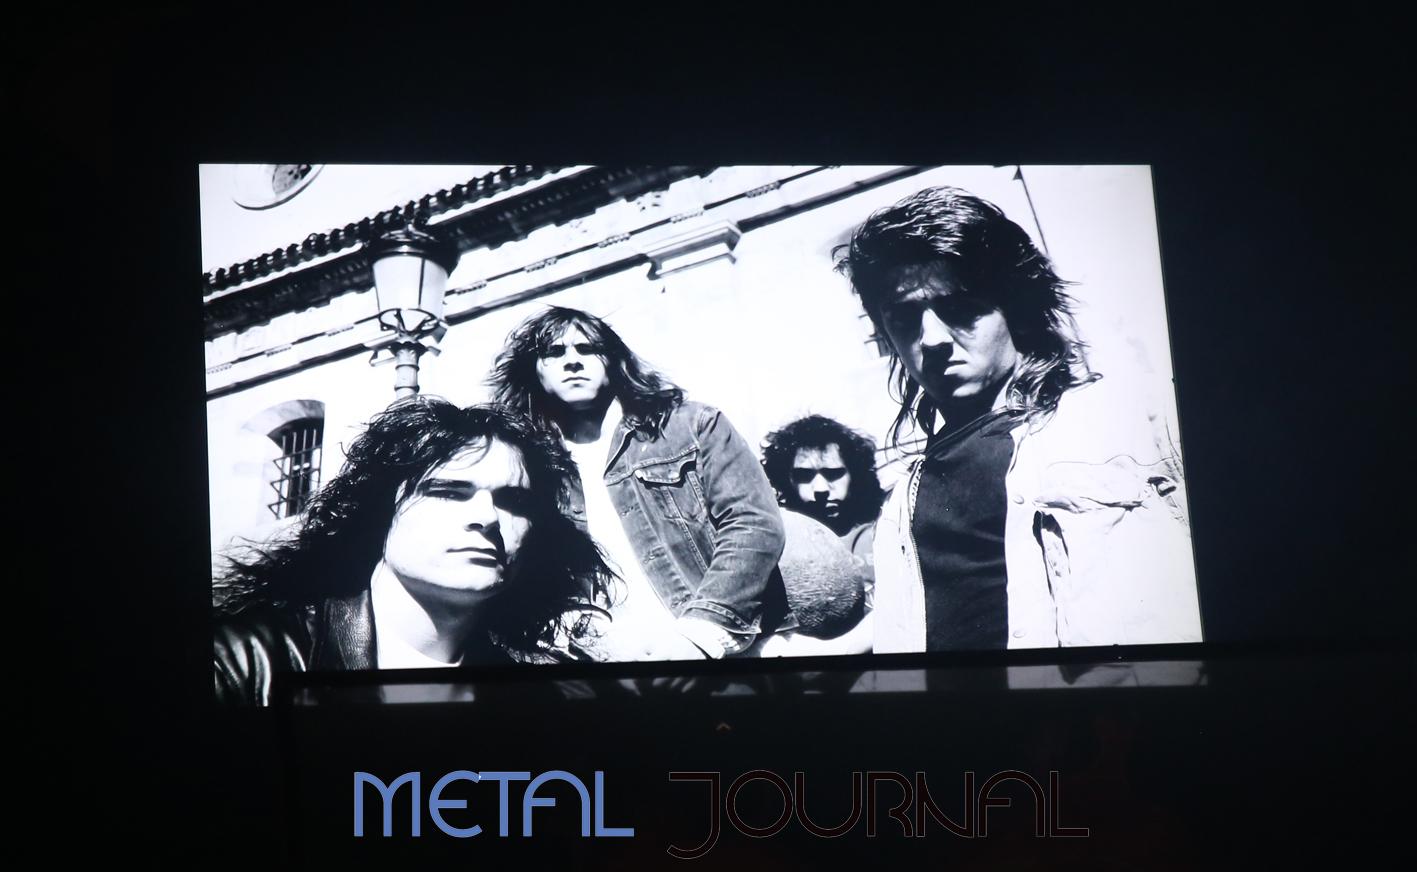 su ta gar 2018 bilbao metal journal pic 10